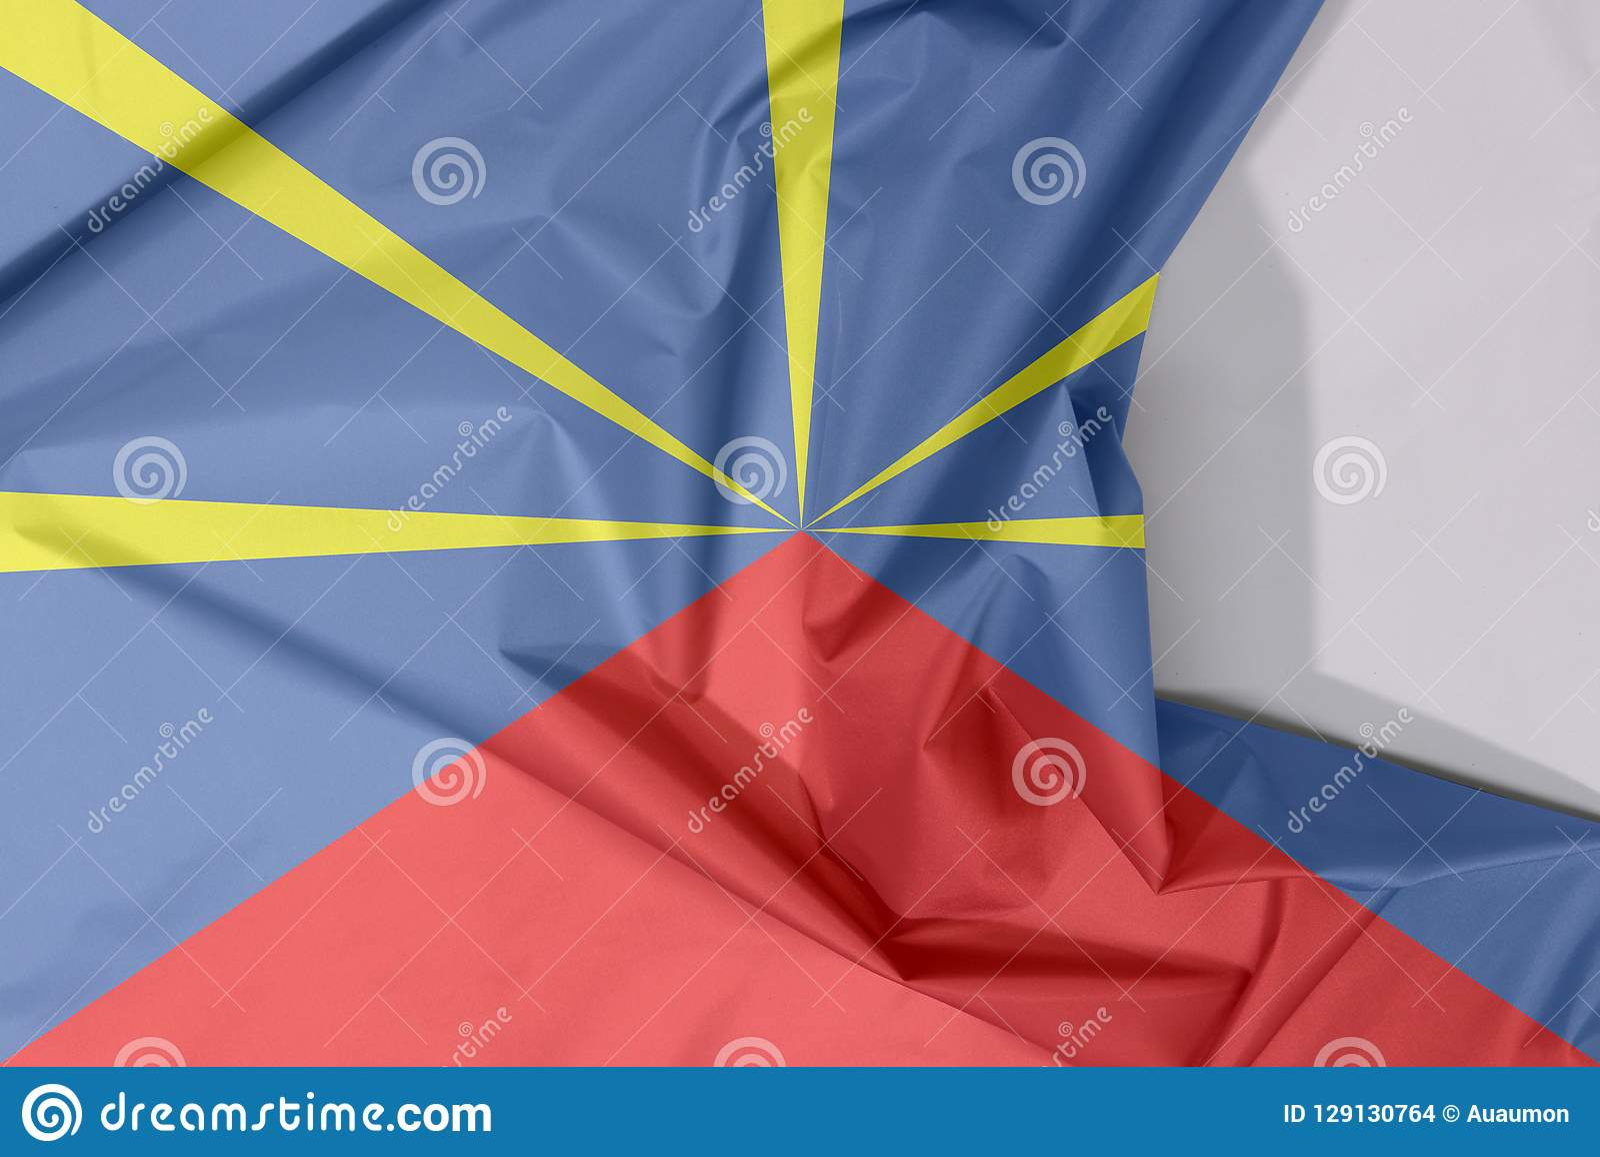 Tissu De La Reunion crêpe et pli de drapeau de tissu de la réunion avec l'espace